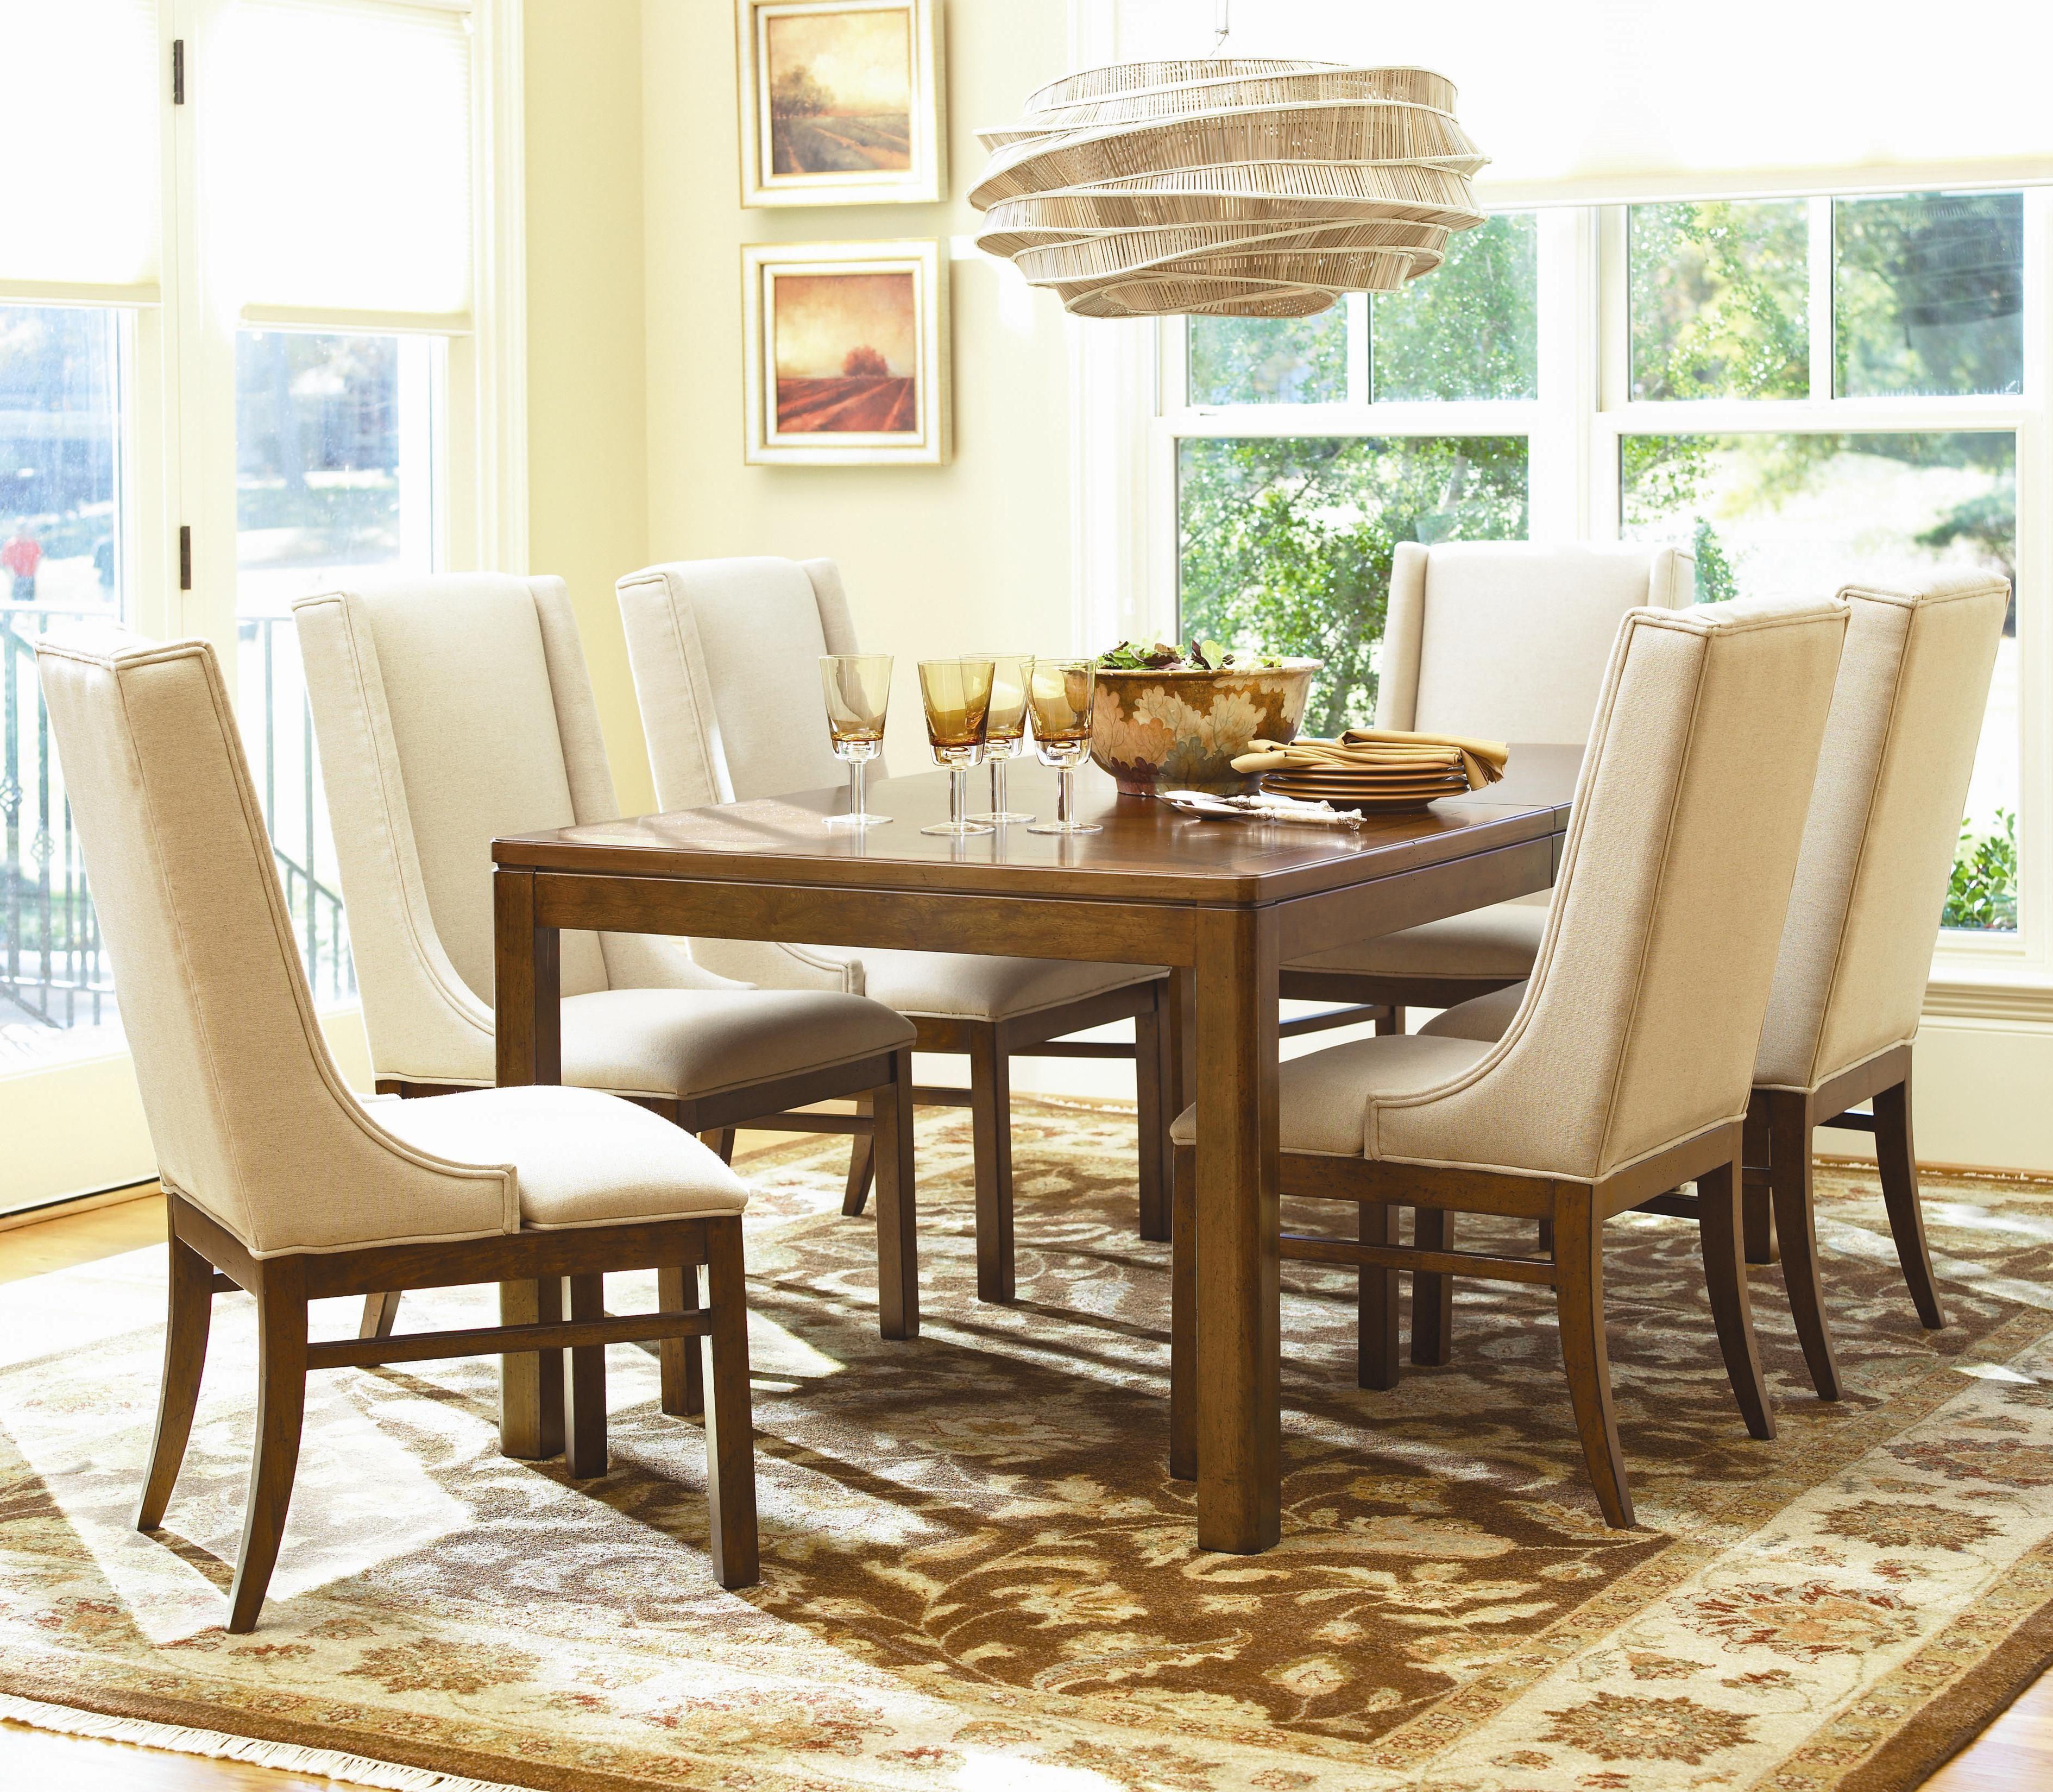 Hilltop Terrace Terrace Seven Piece Table & Chair Set by Better ...